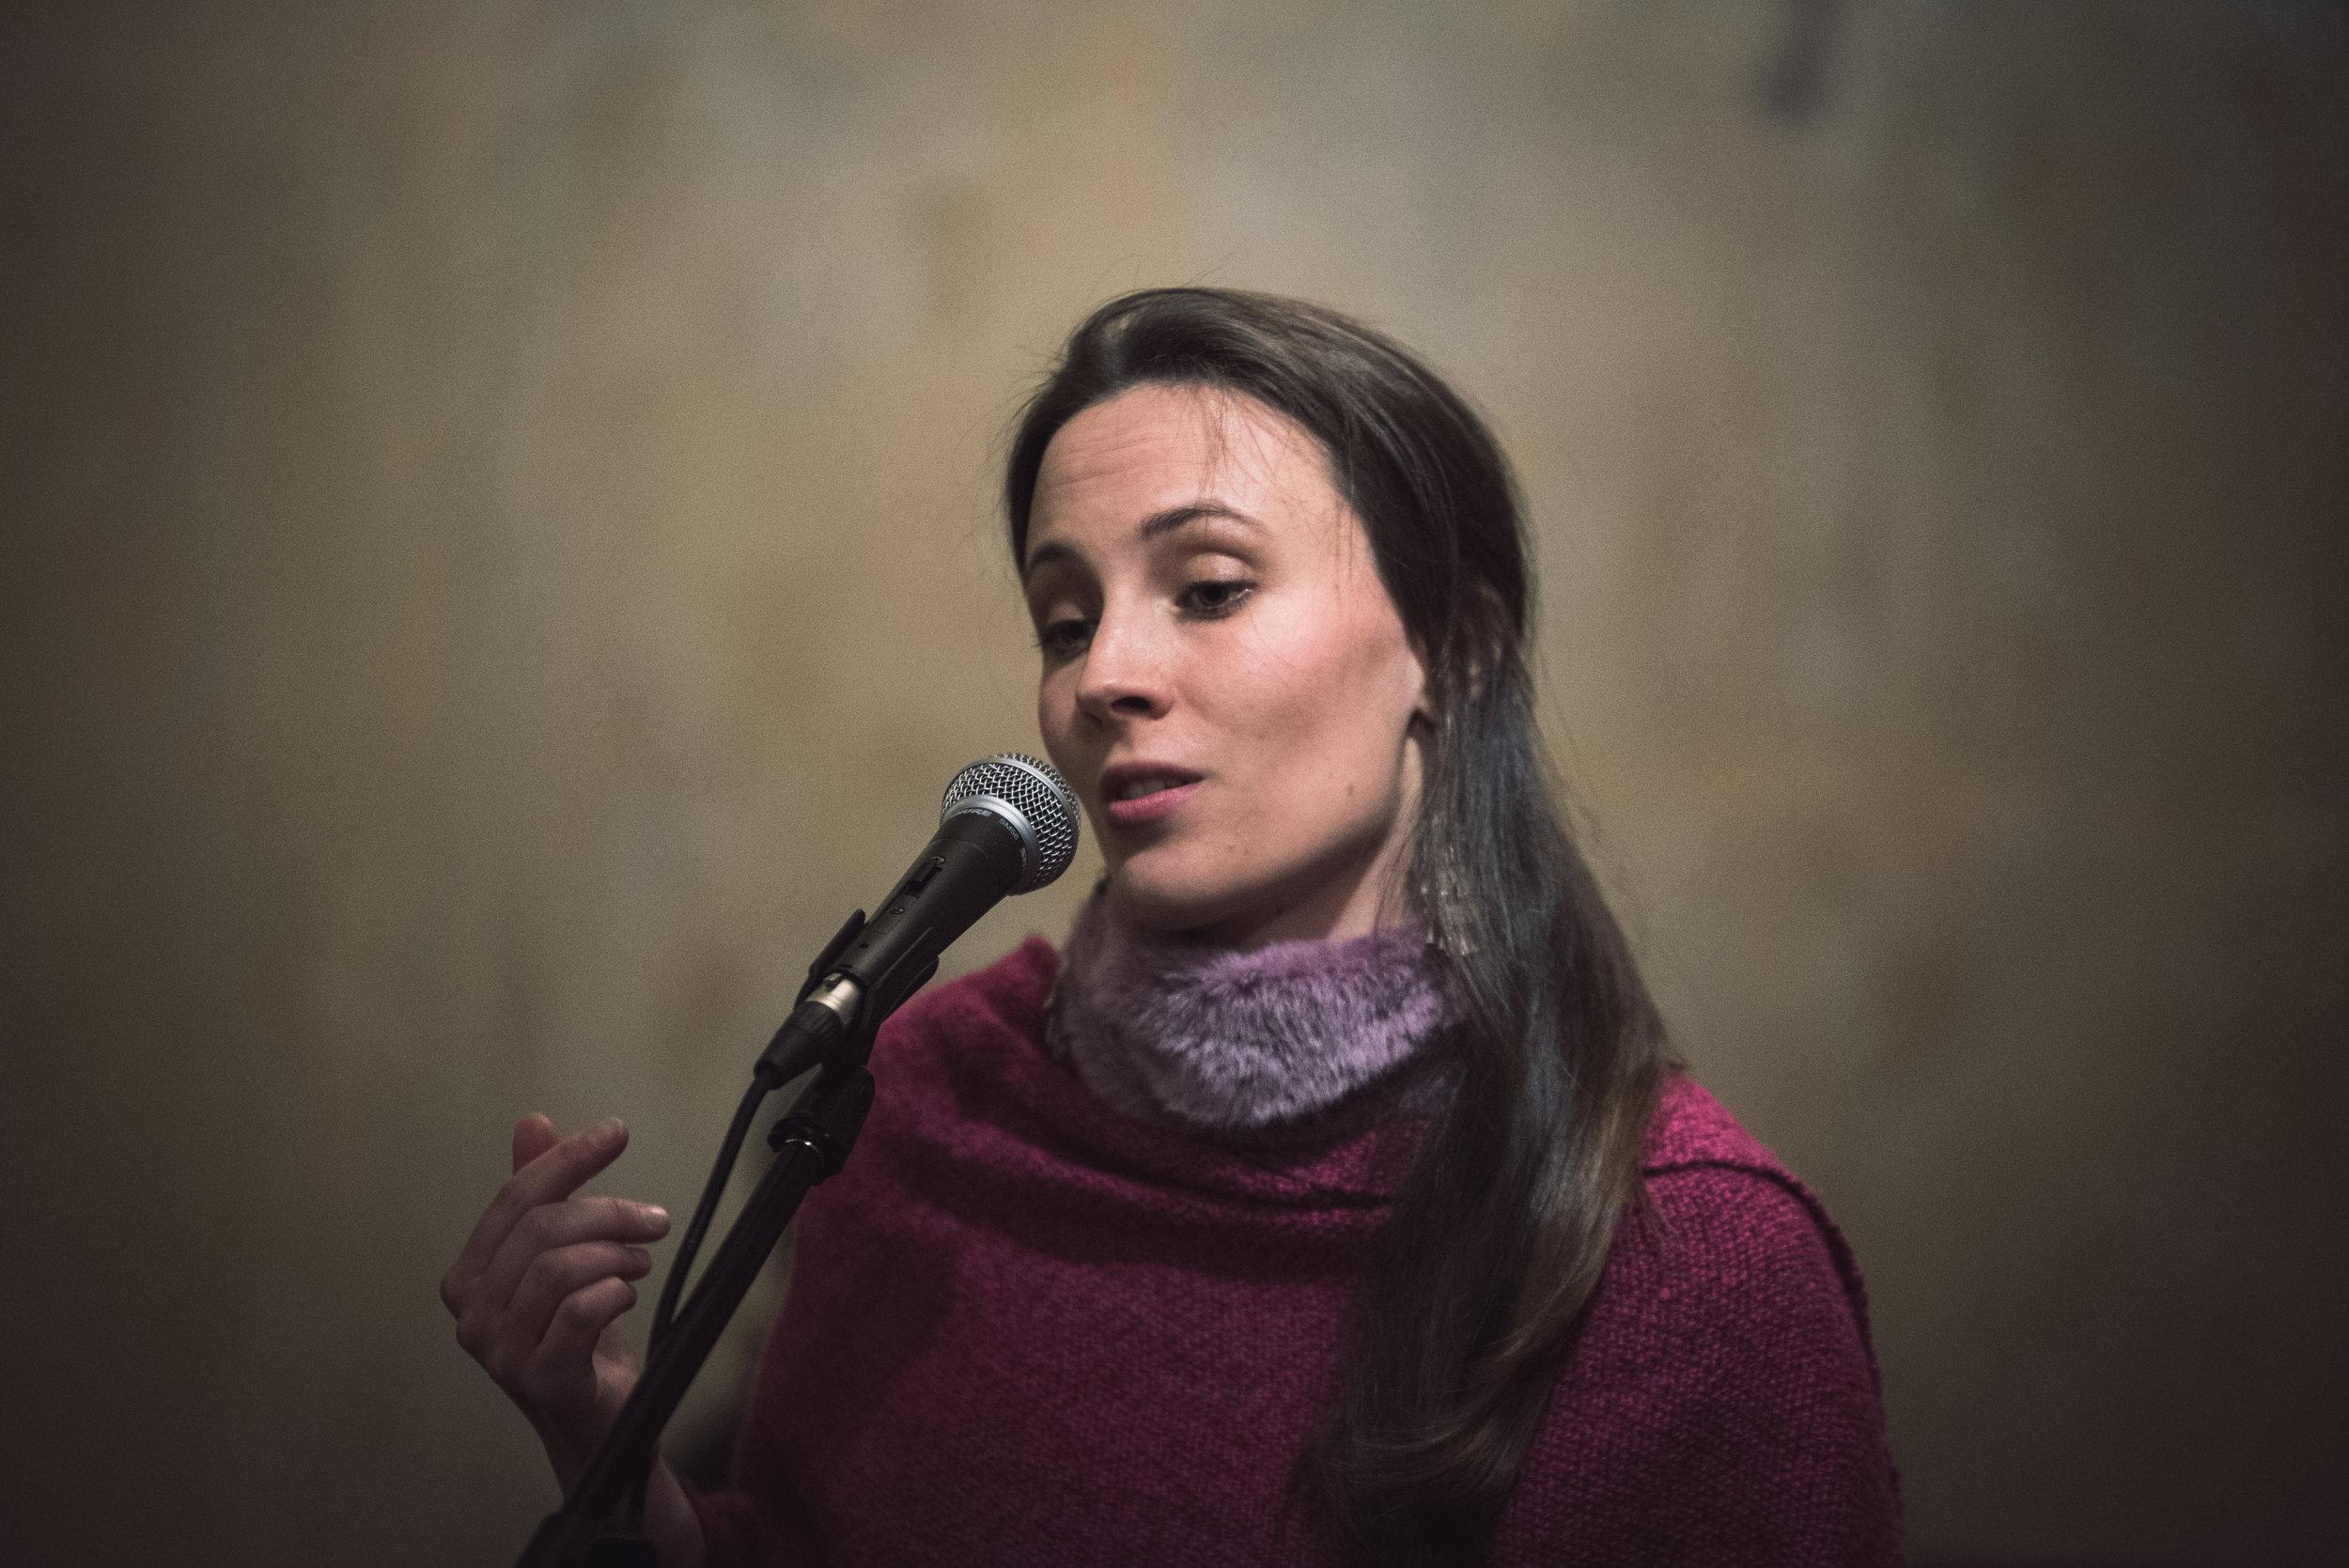 Luise Rauer